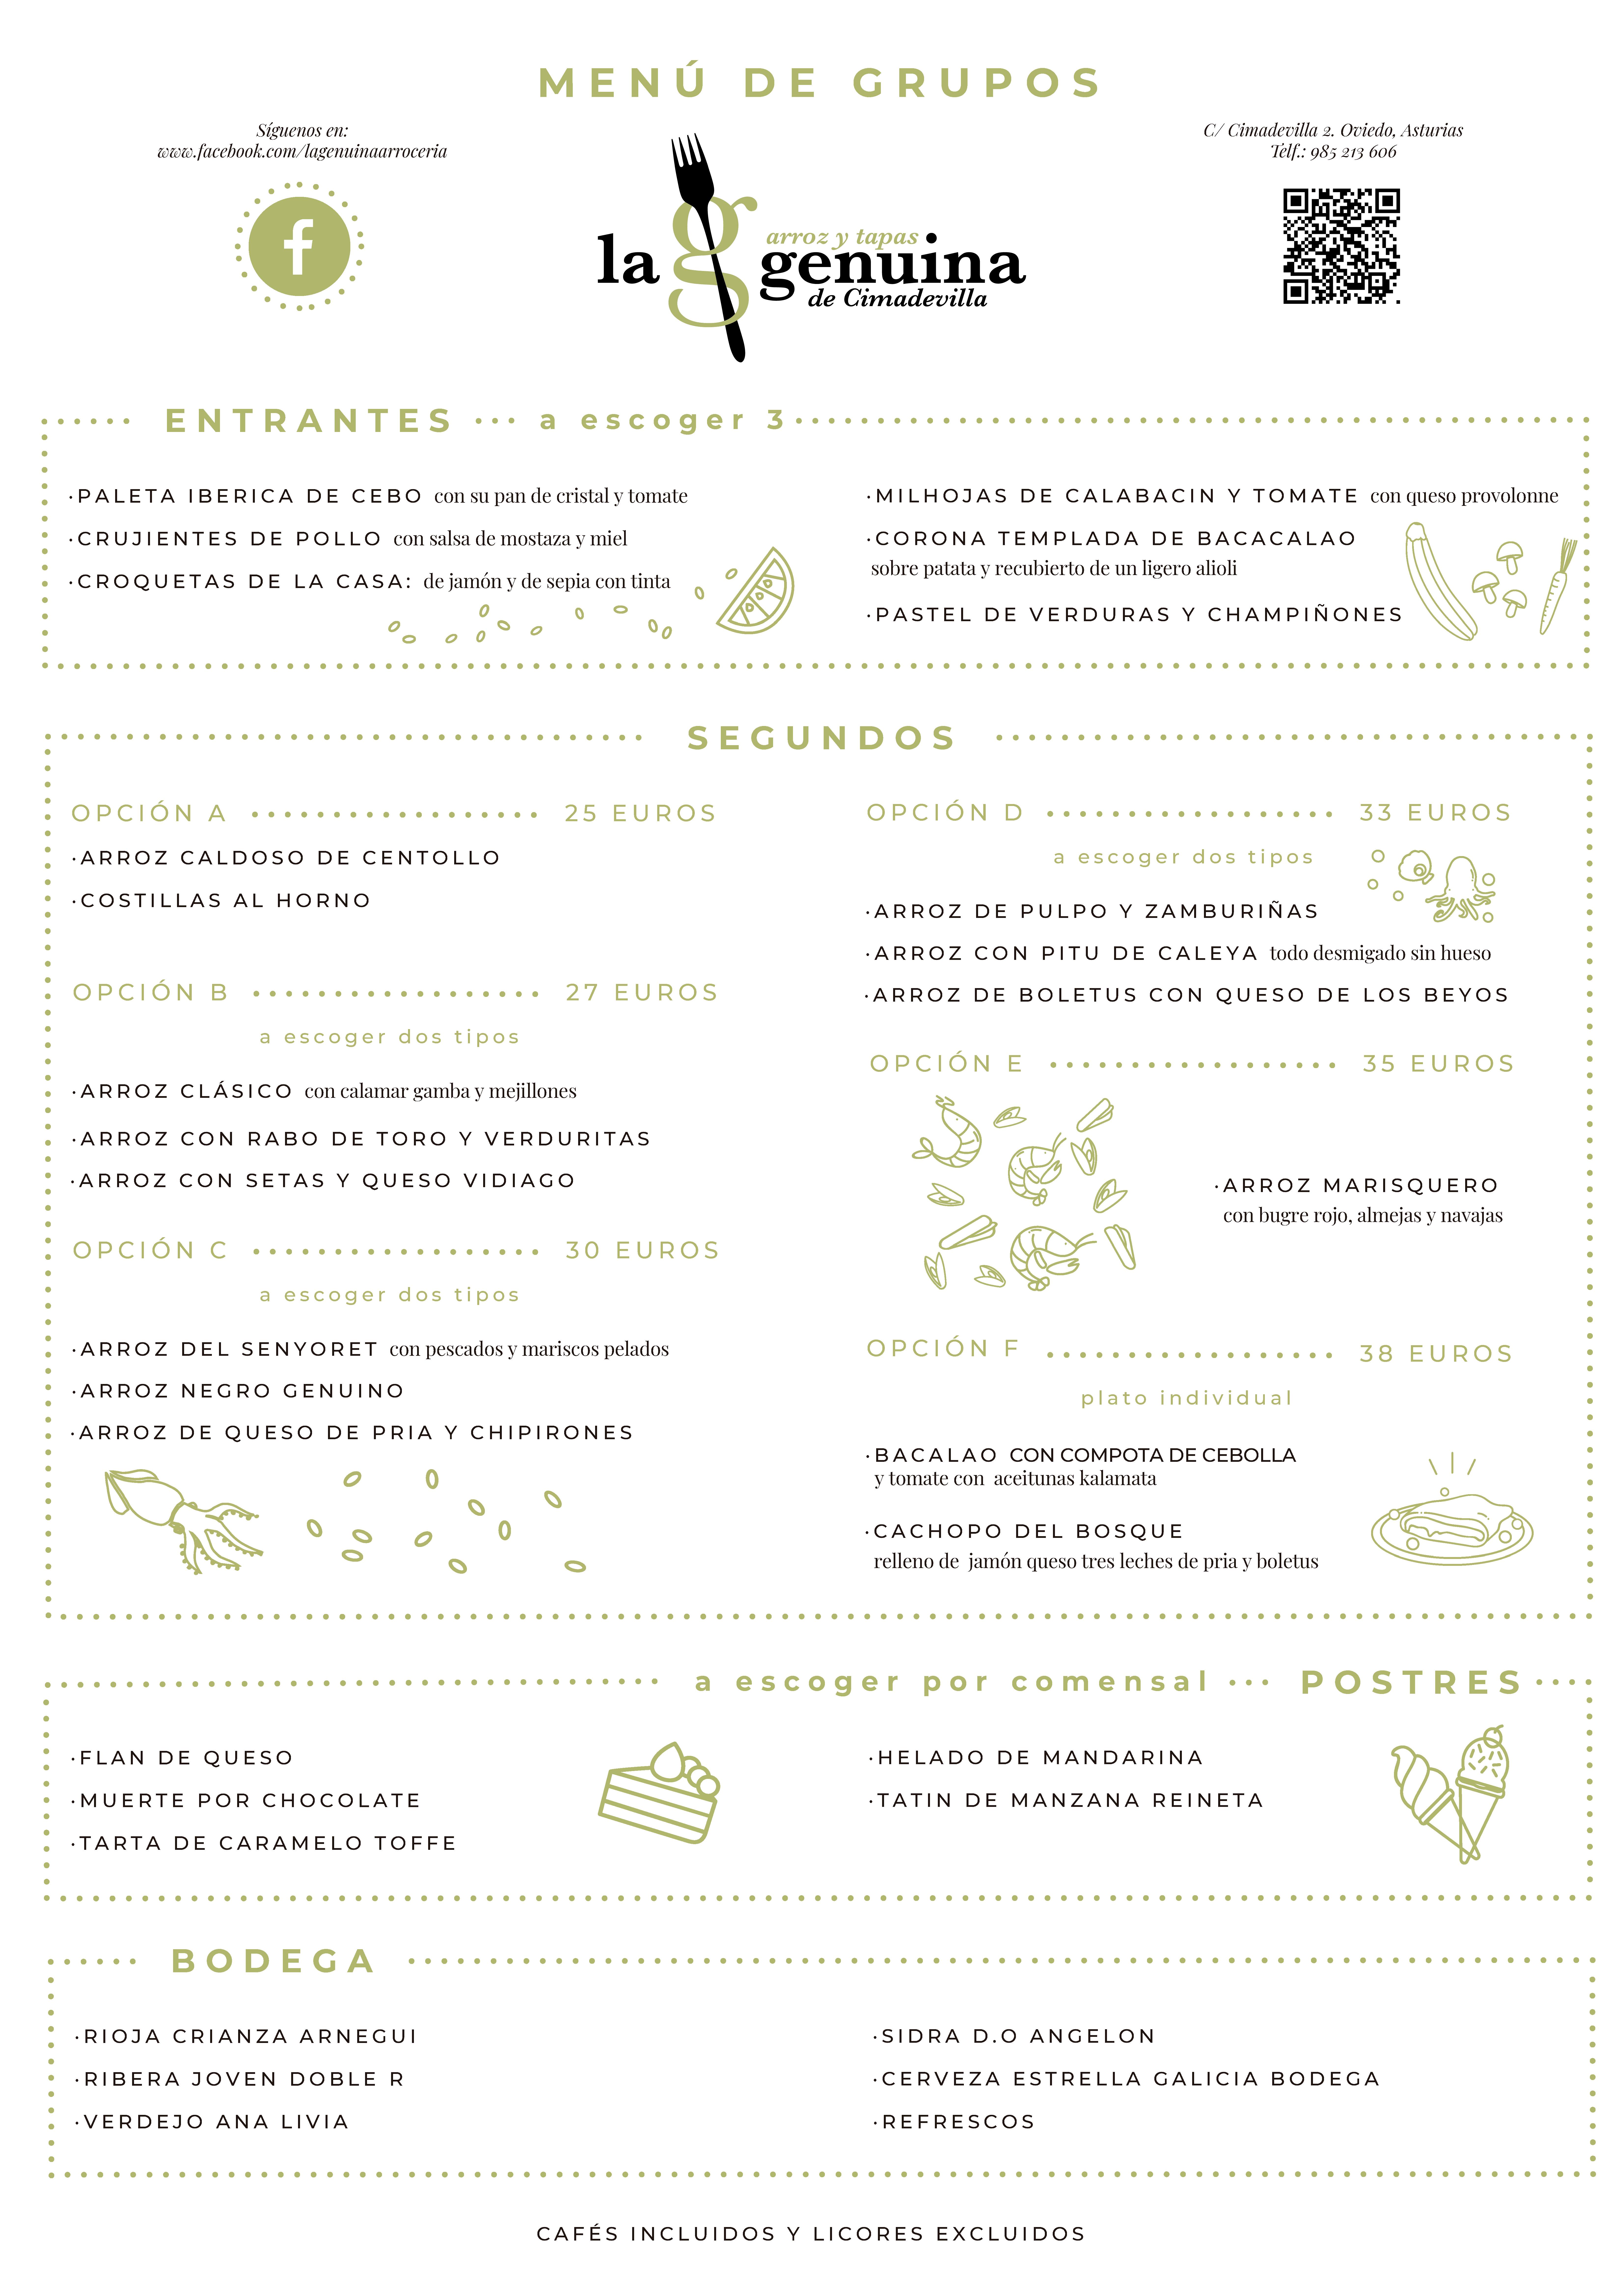 carta-menus-grupos-la-genuina-junio-2021-min